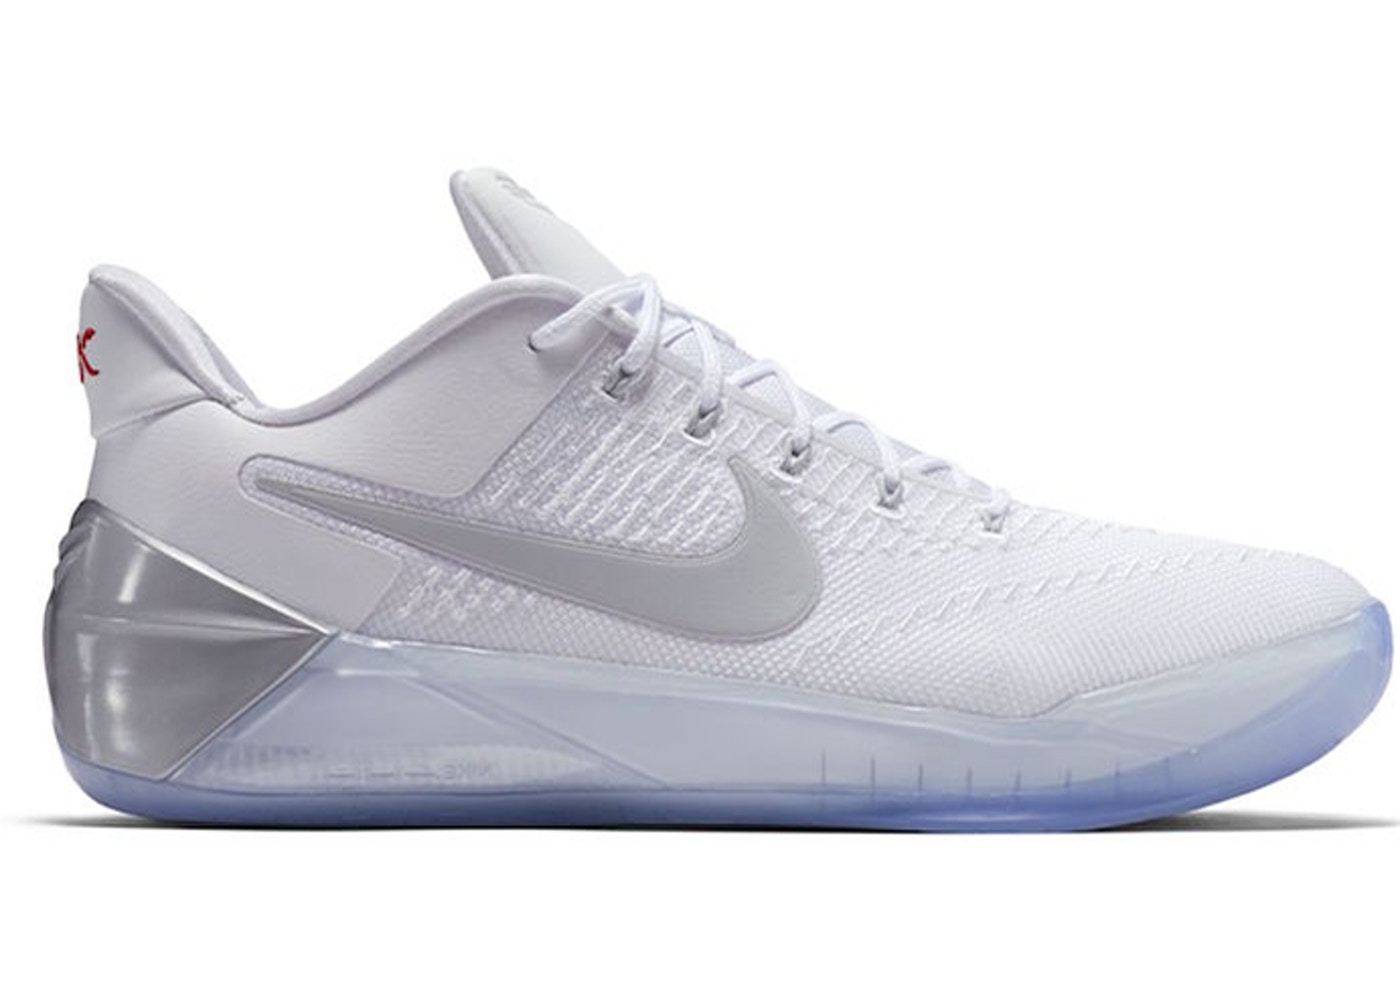 49986e03601 Nike Kobe Shoes - Volatility